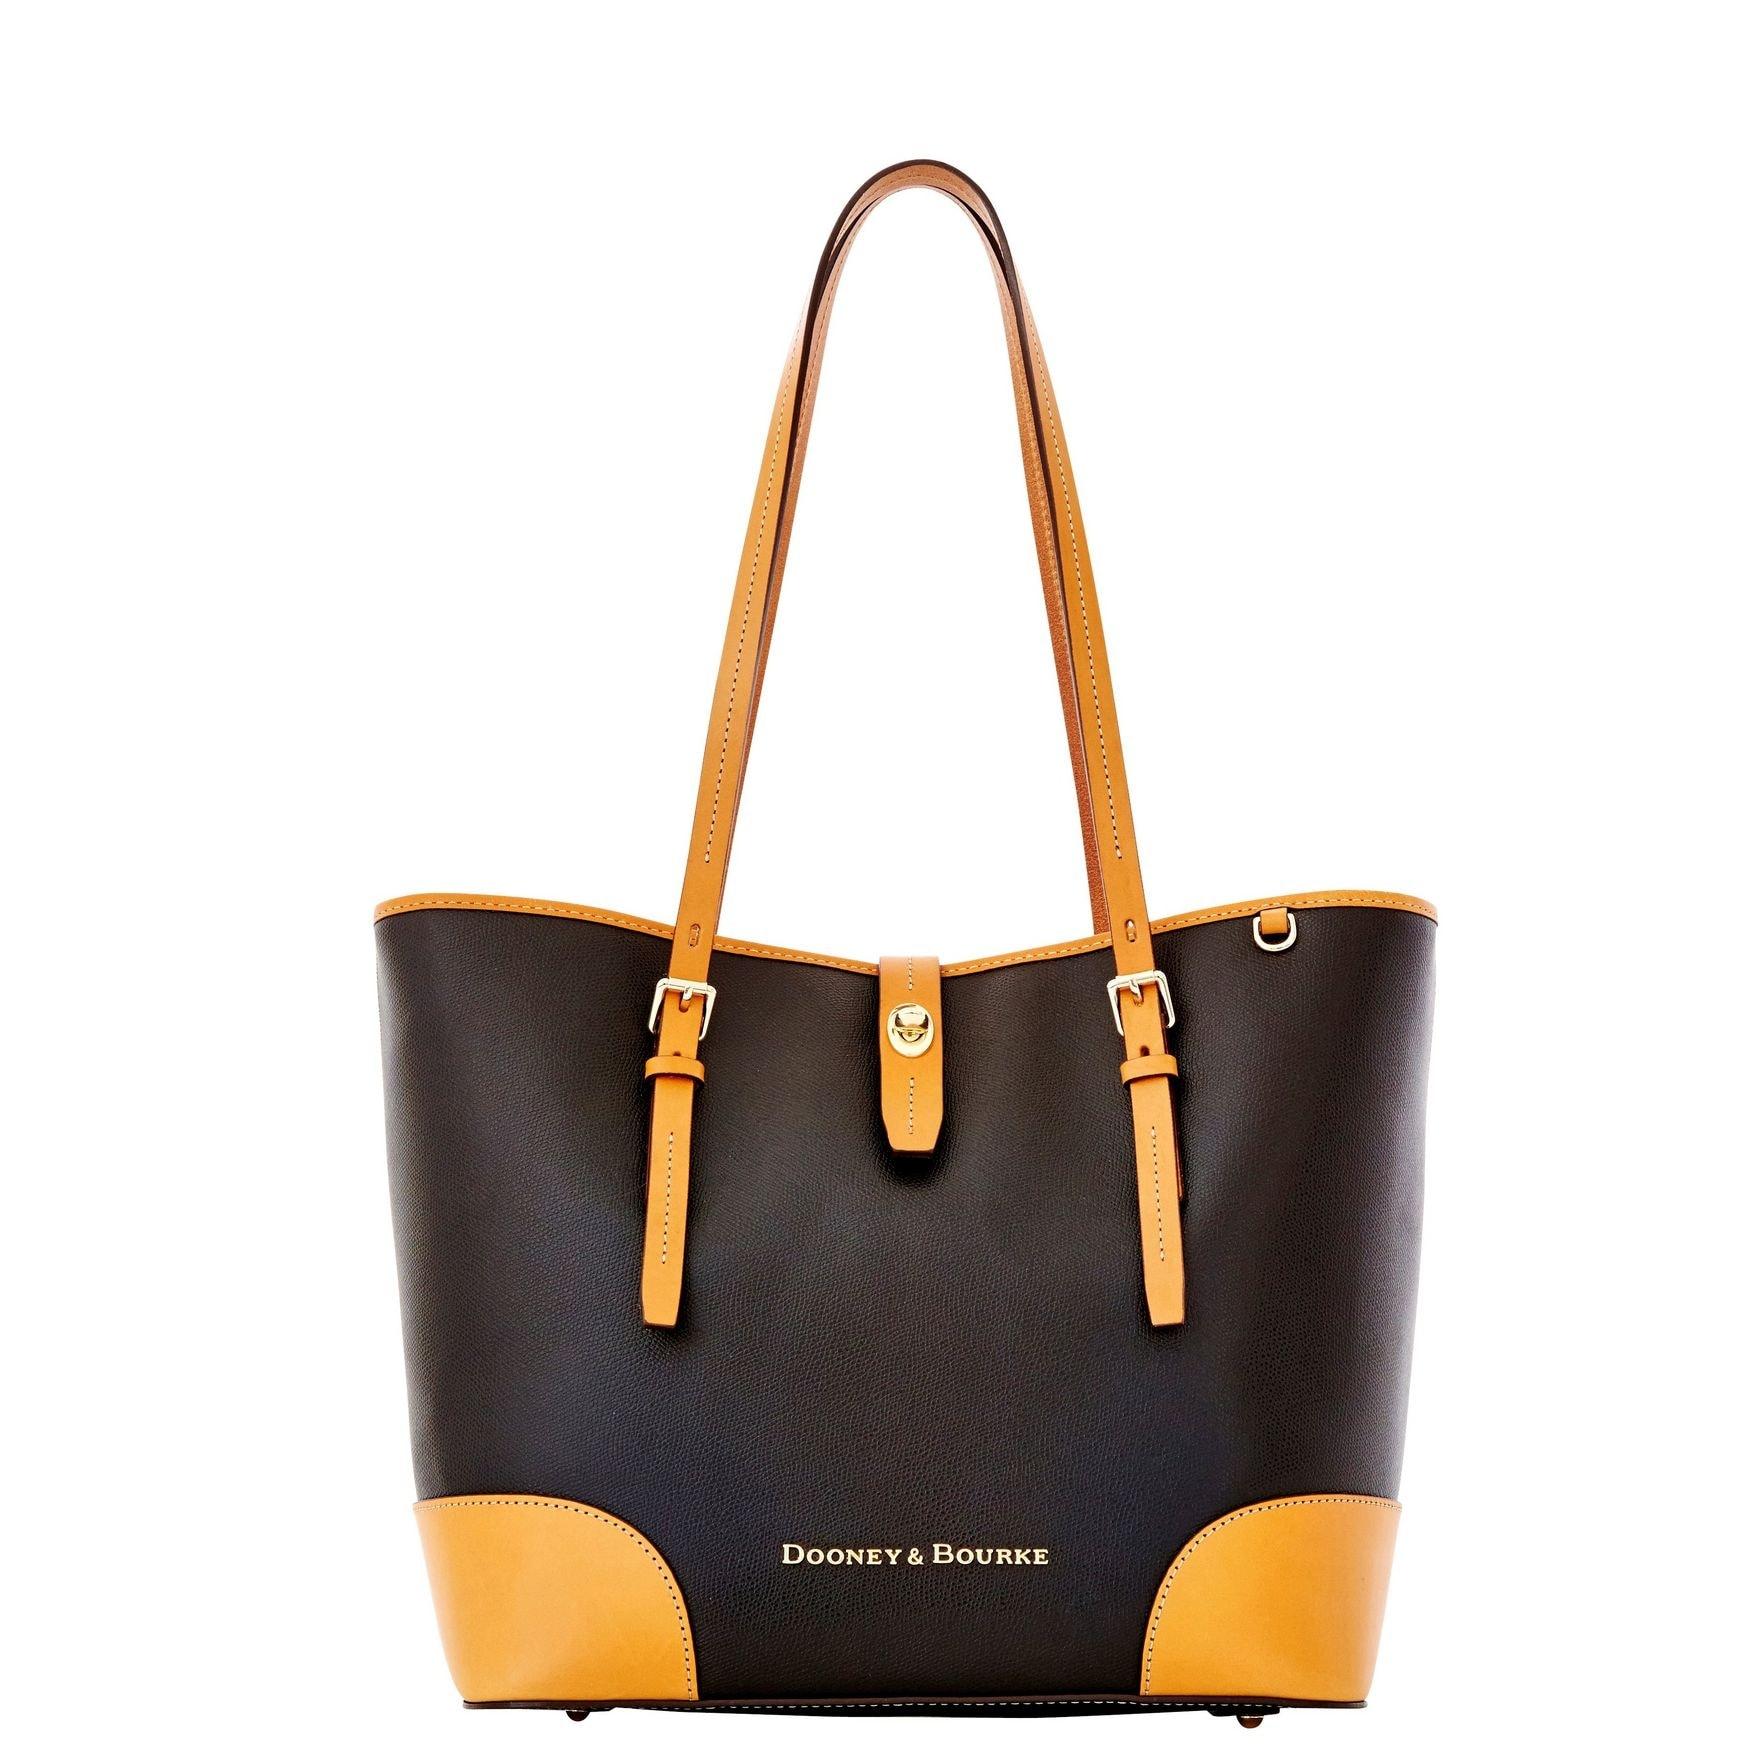 e213a2d81f4 Designer Handbags | Shop Online at Overstock